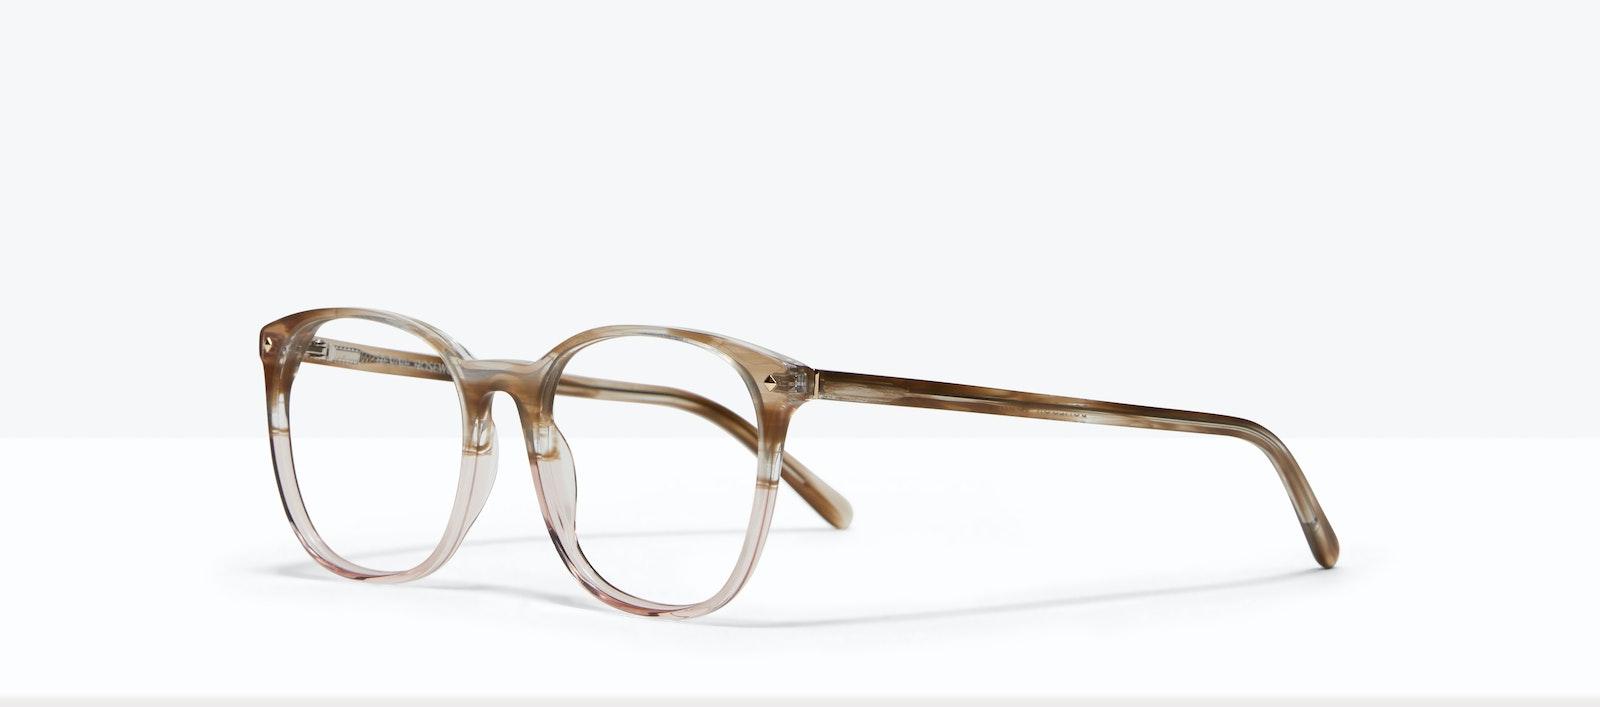 Affordable Fashion Glasses Round Eyeglasses Women Revive Rosewood Tilt